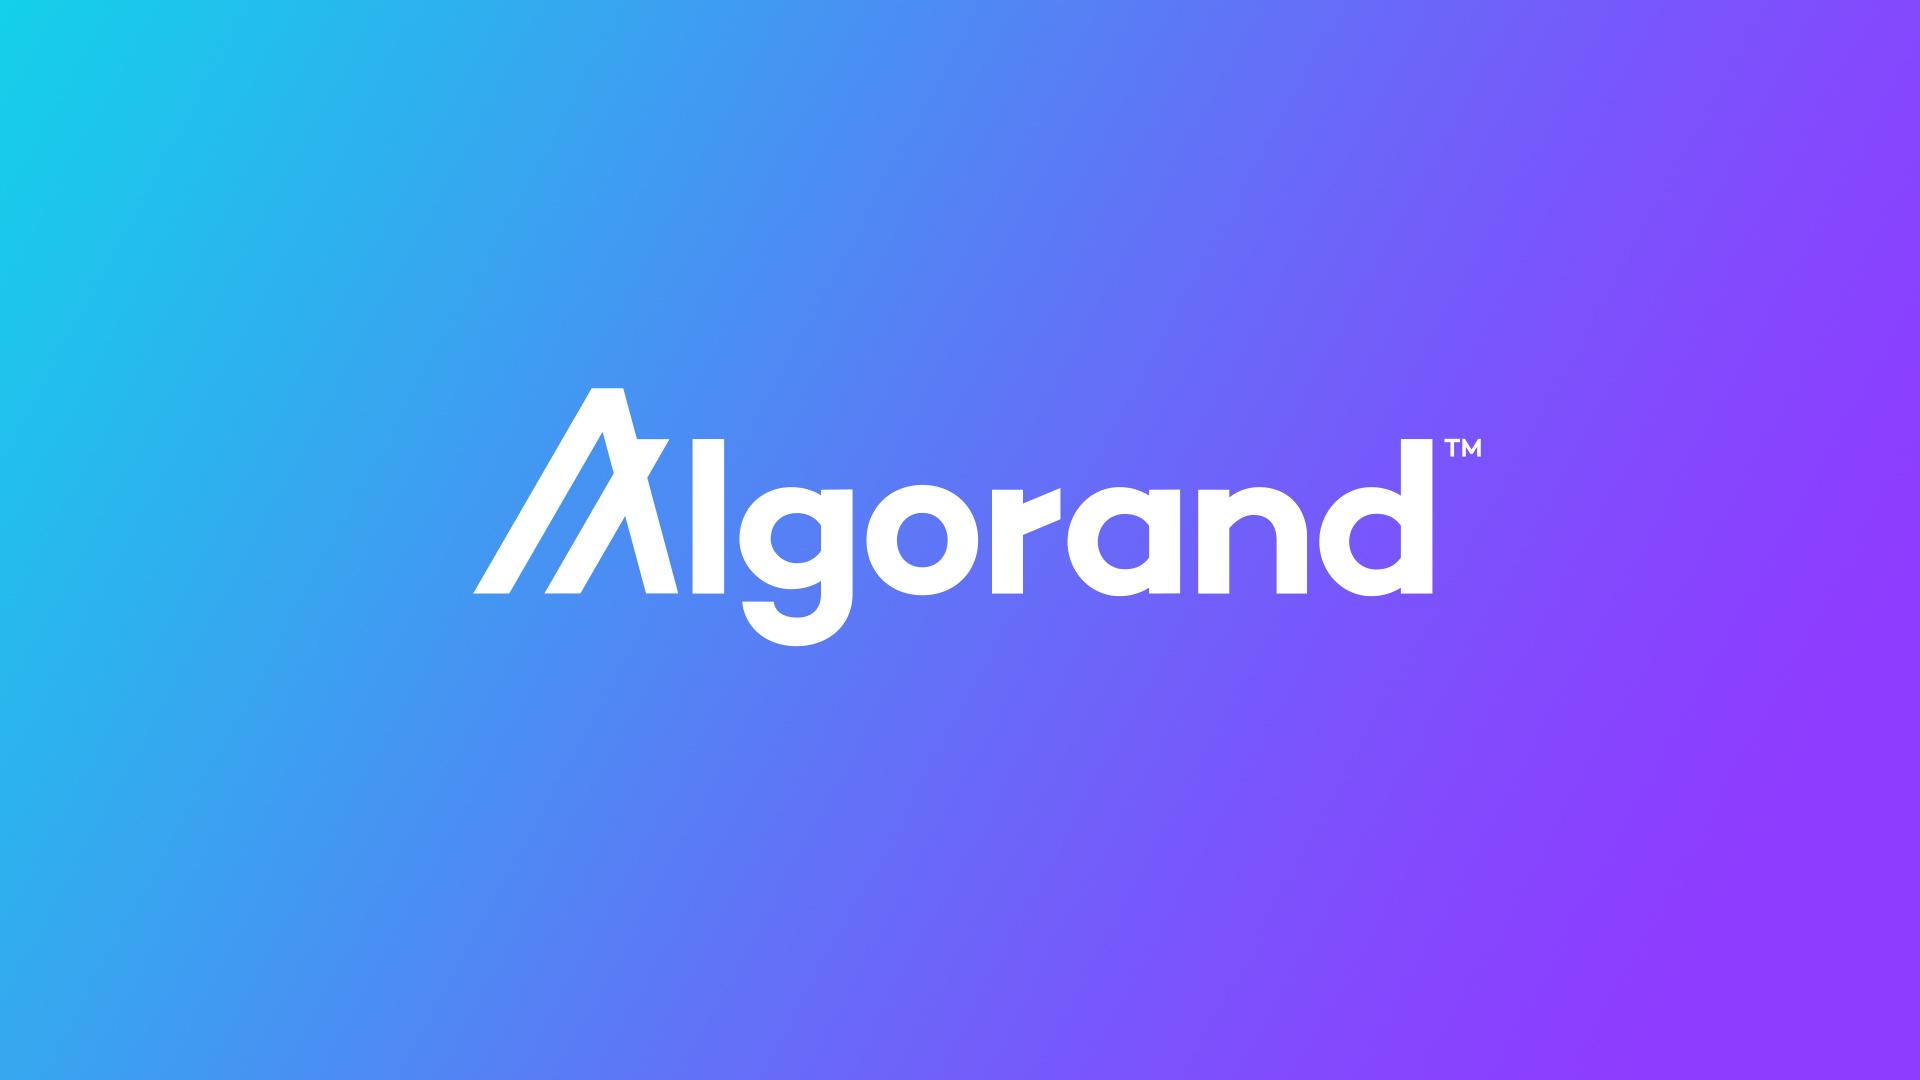 Algorand sets up $330 million fund that's focused on DeFi